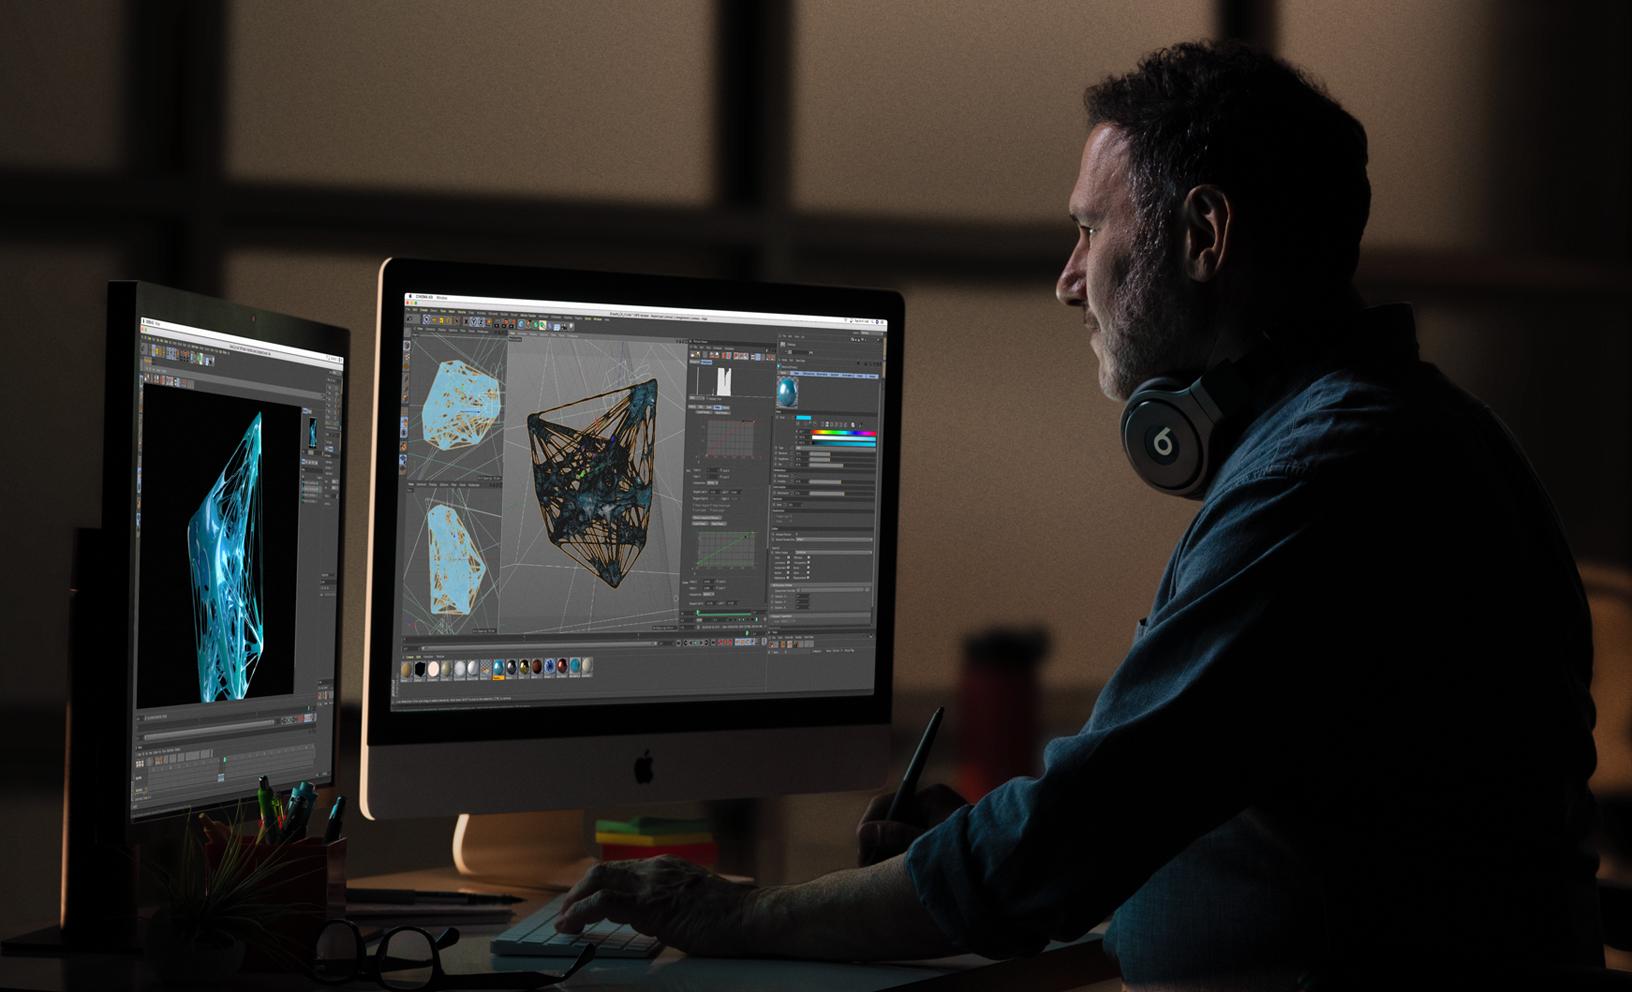 https://www.apple.com/newsroom/images/product/mac/standard/Apple-iMac-gets-2x-more-performance-man-in-editing-studio-03192019_big.jpg.large_2x.jpg